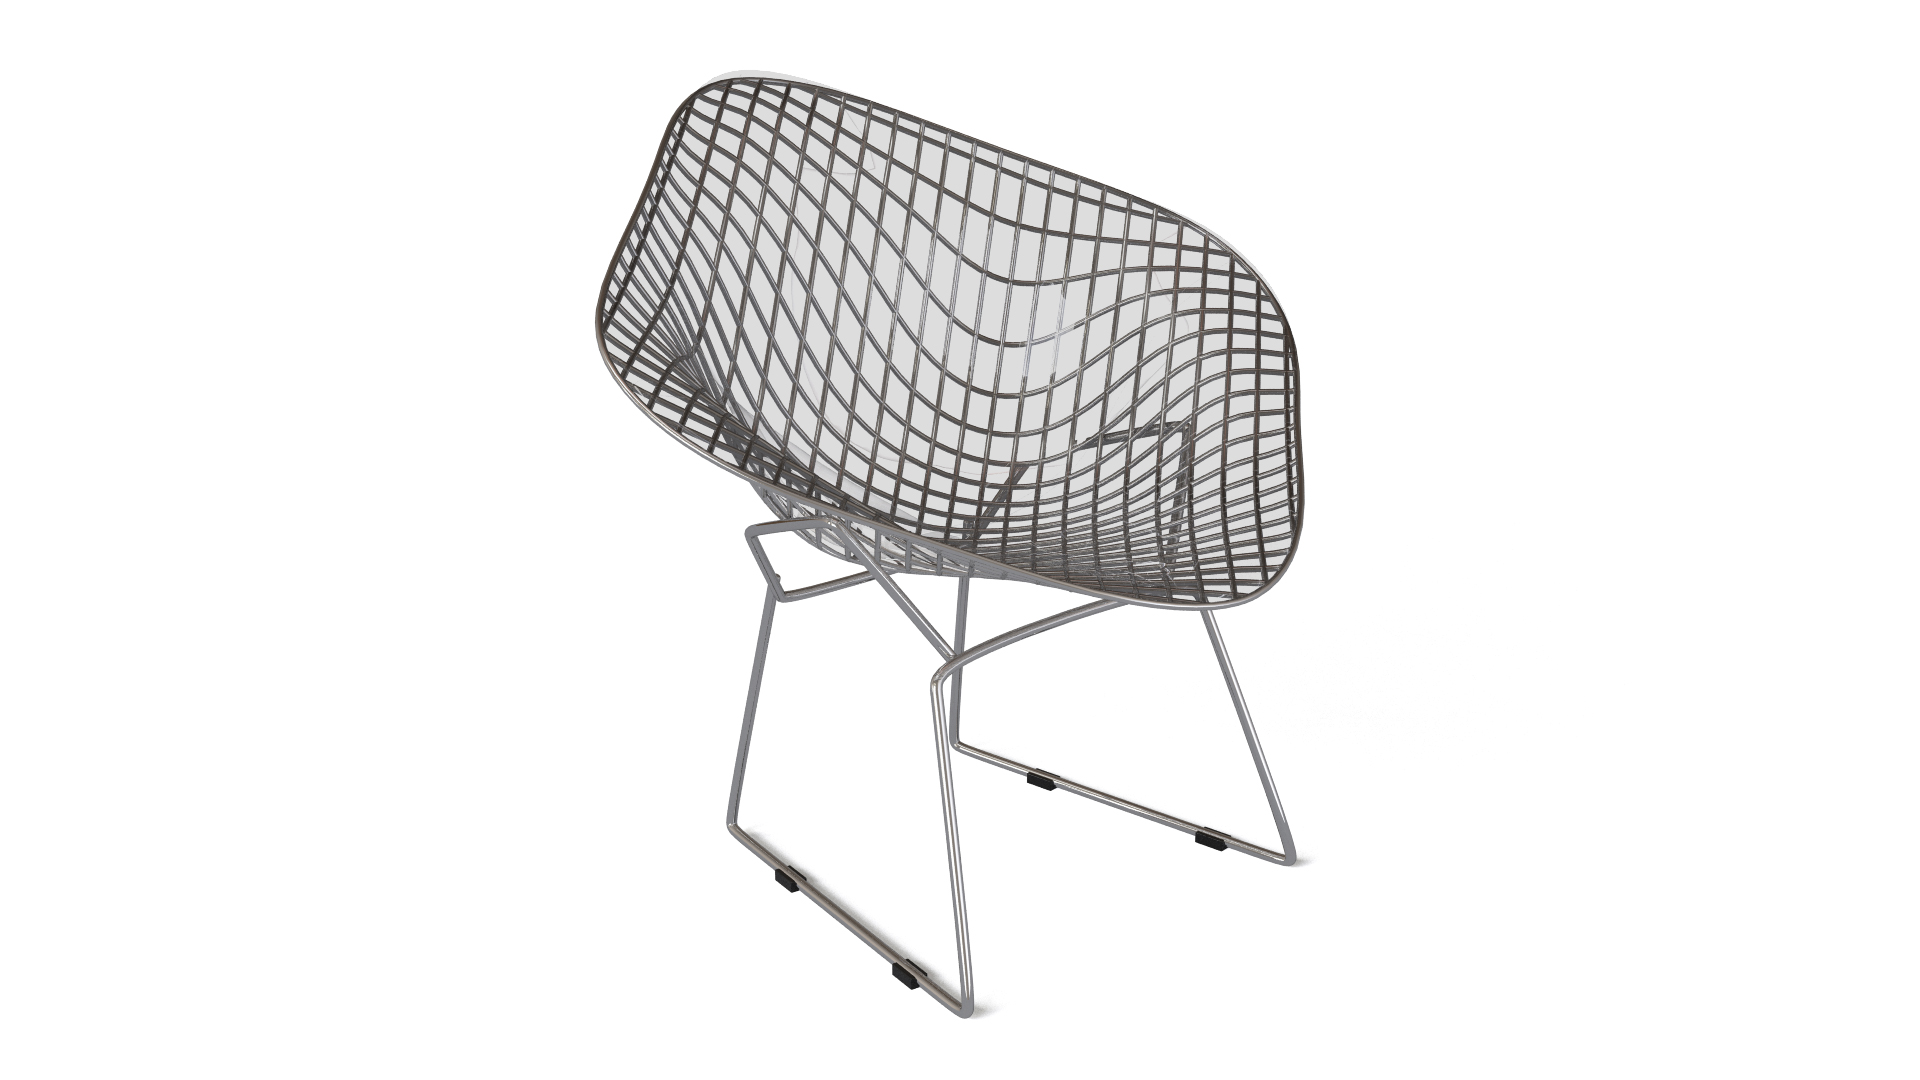 chaise diamond bertoia beautiful couleurs prsentation de chaise diamond style harry bertoia. Black Bedroom Furniture Sets. Home Design Ideas